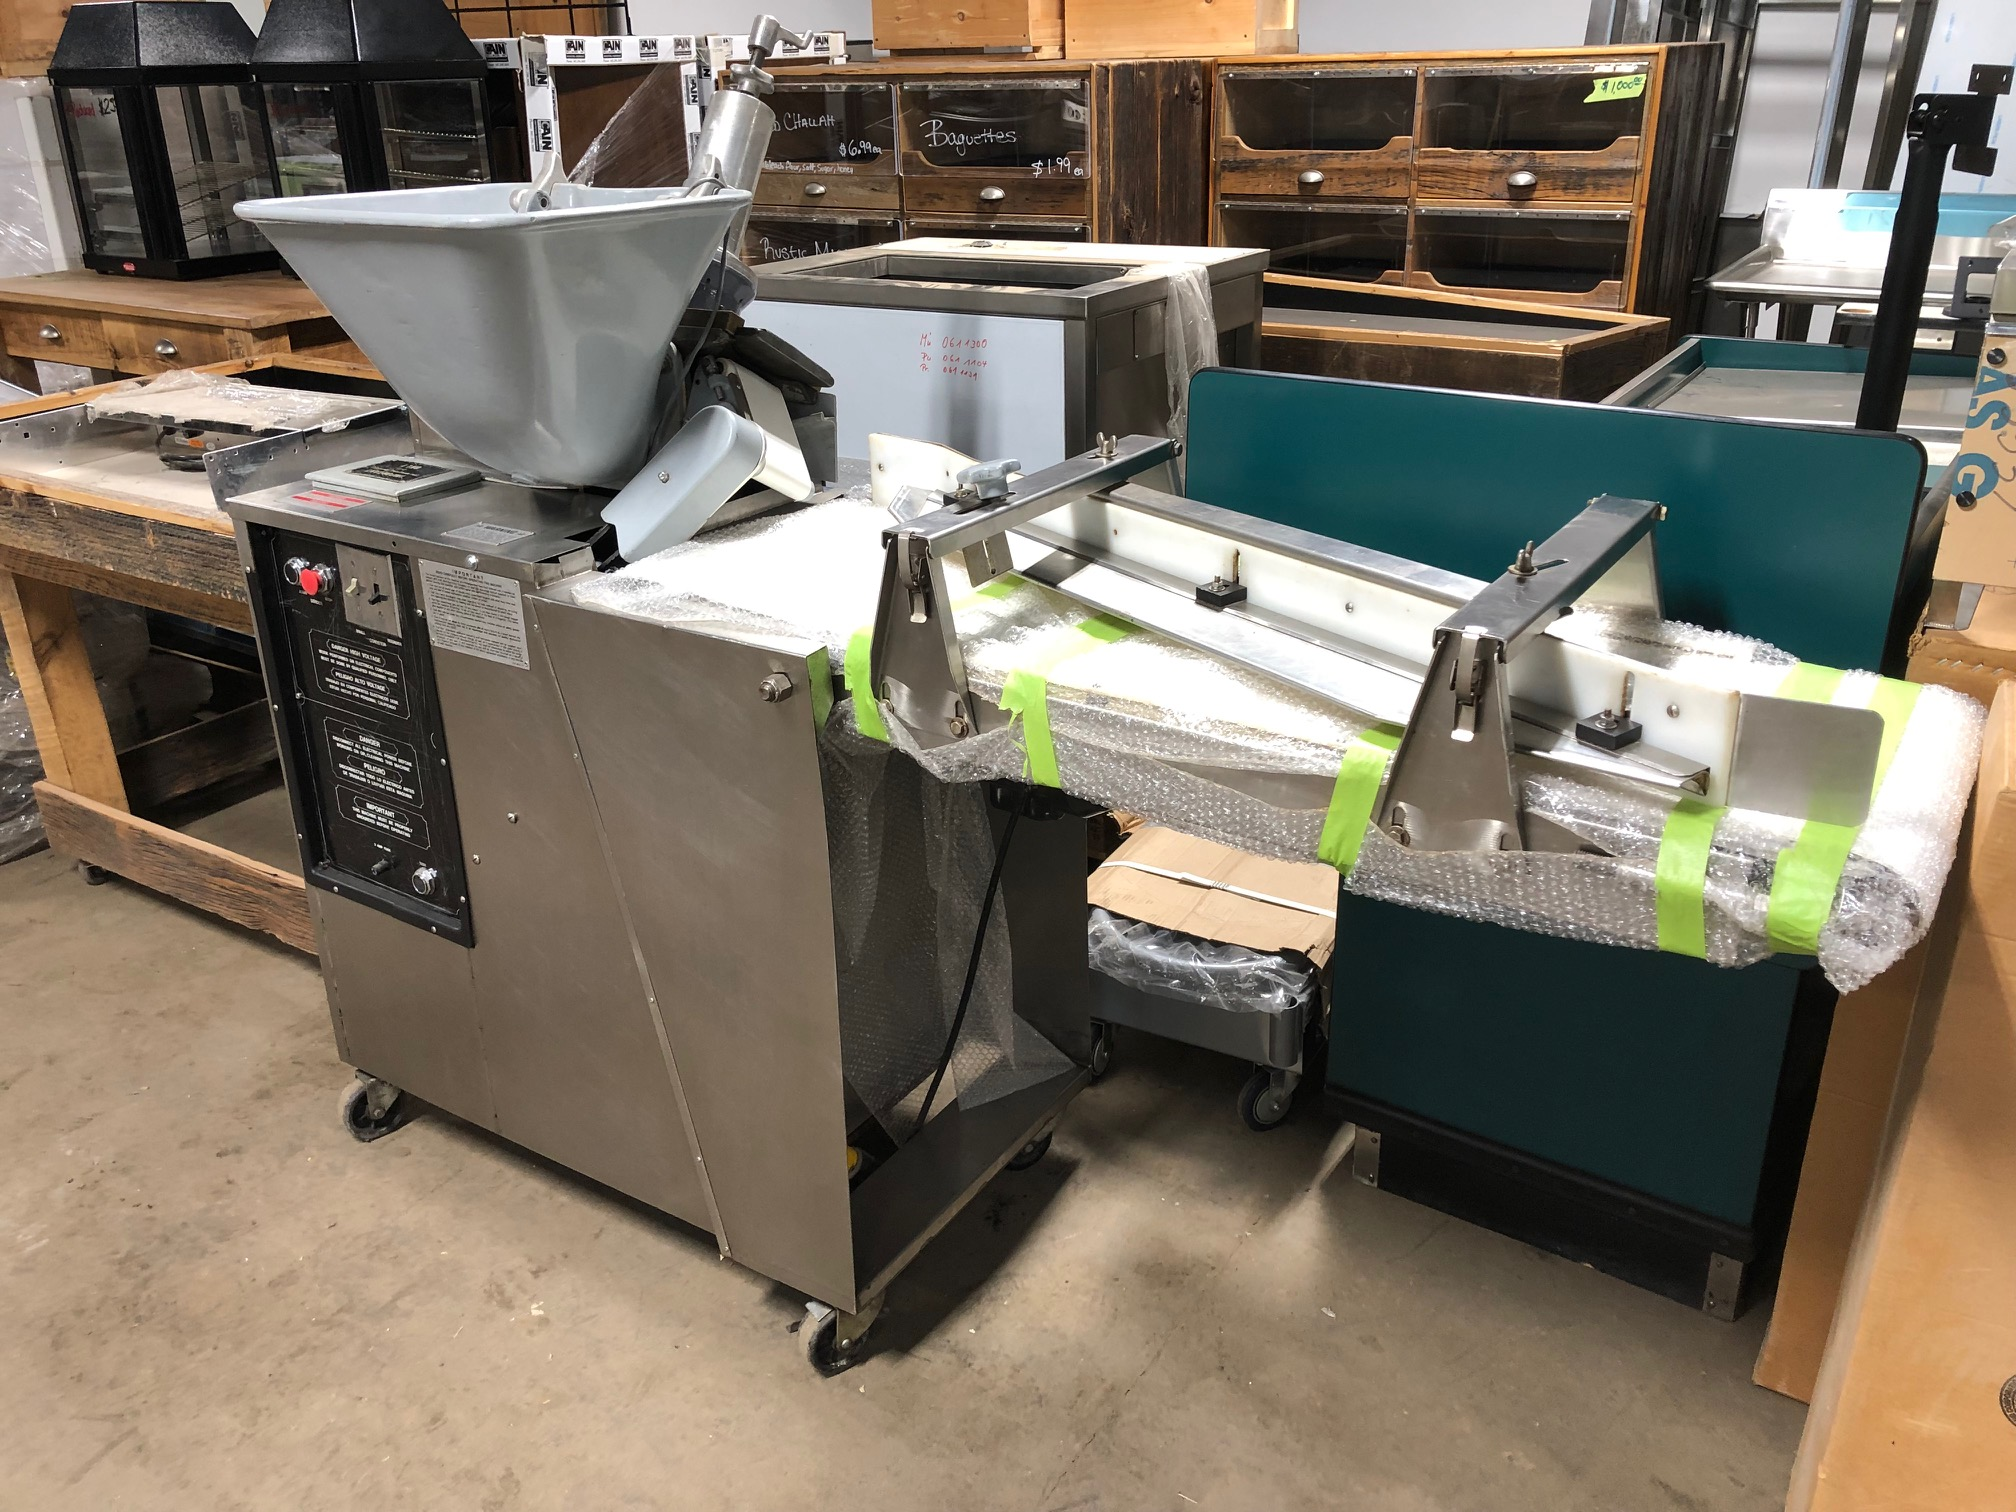 Scale-O-Matic S-400- $9,500.00